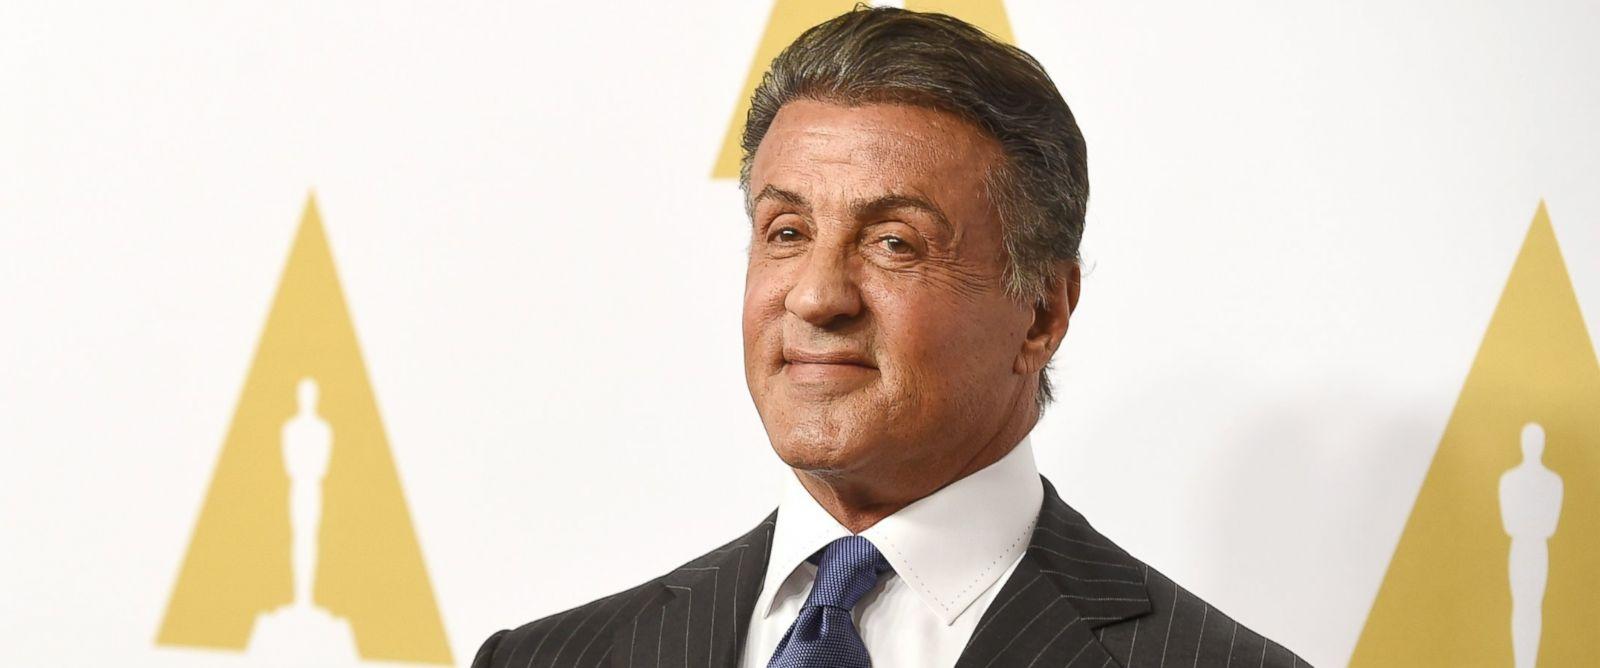 Slyvester Stallone May Boycott the Oscars